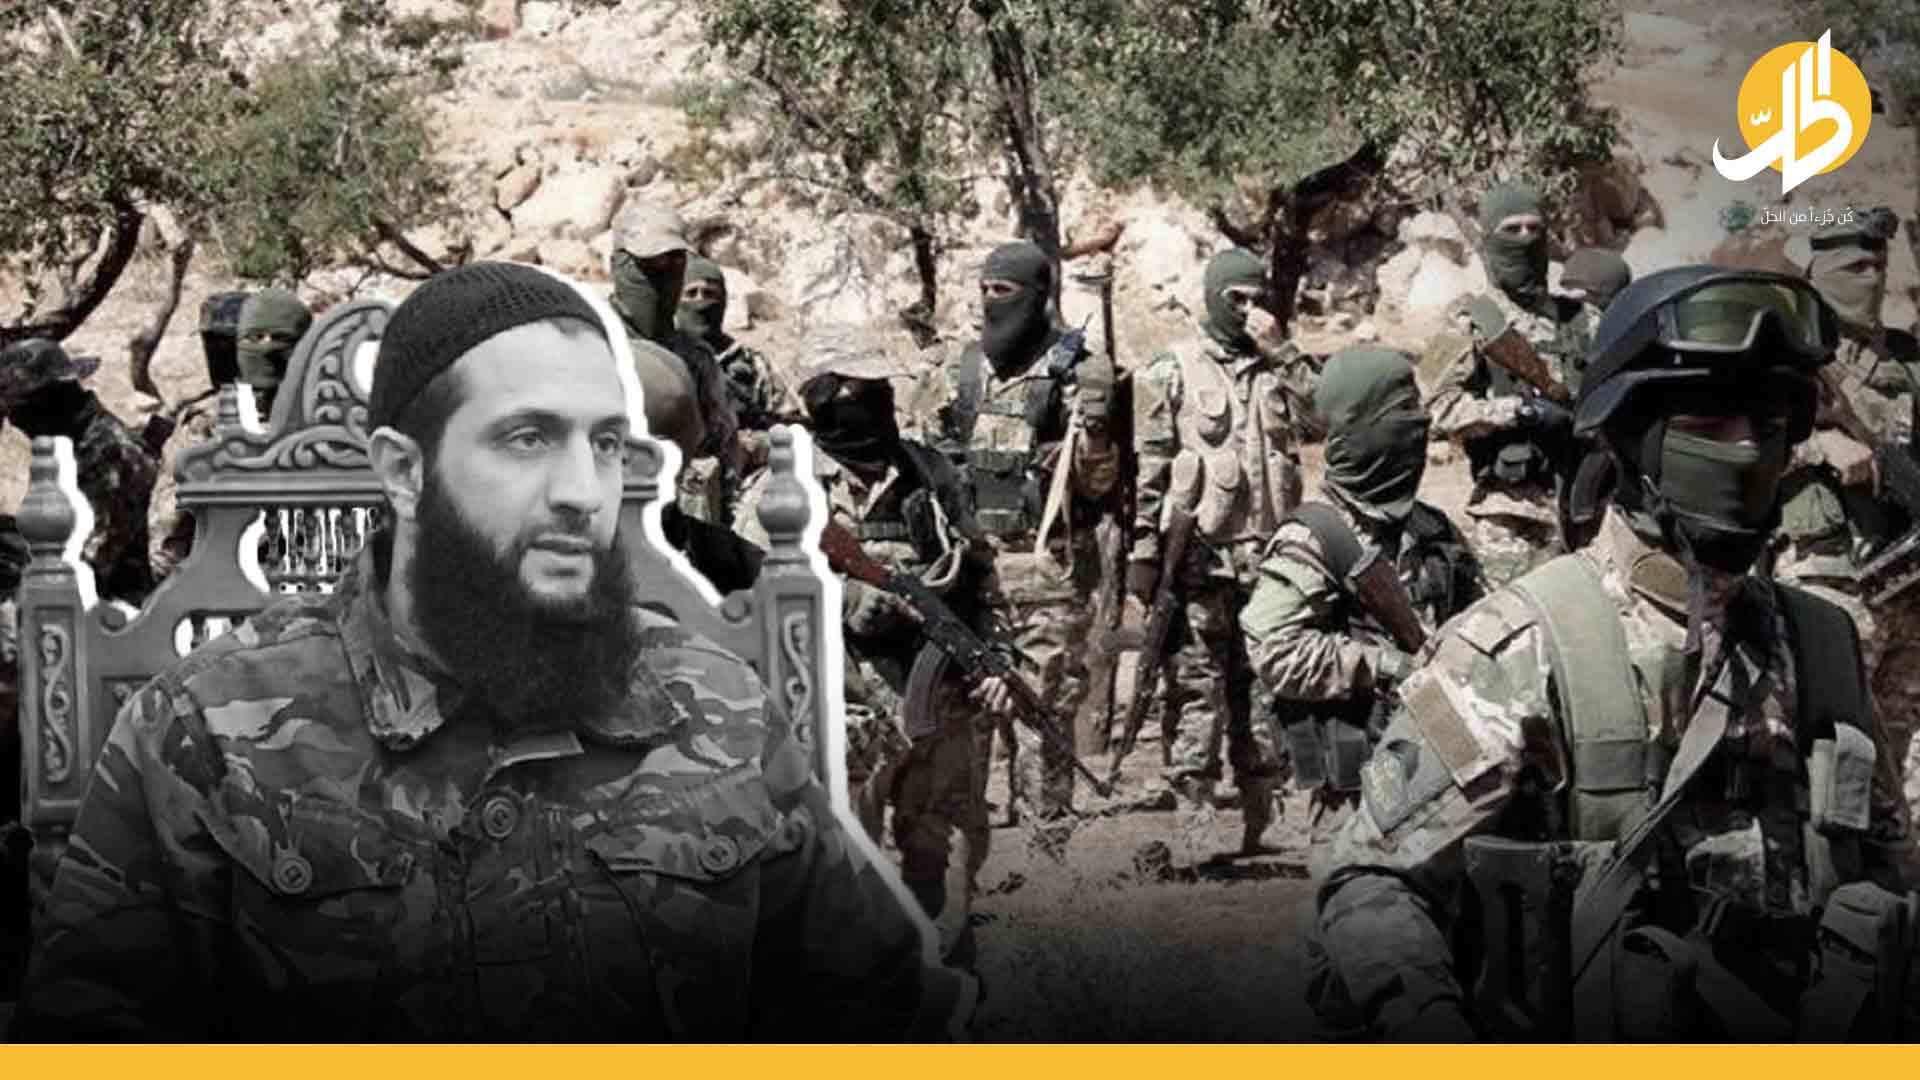 Afghanization of Idleb: al-Joulani Model in Northwestern Syria